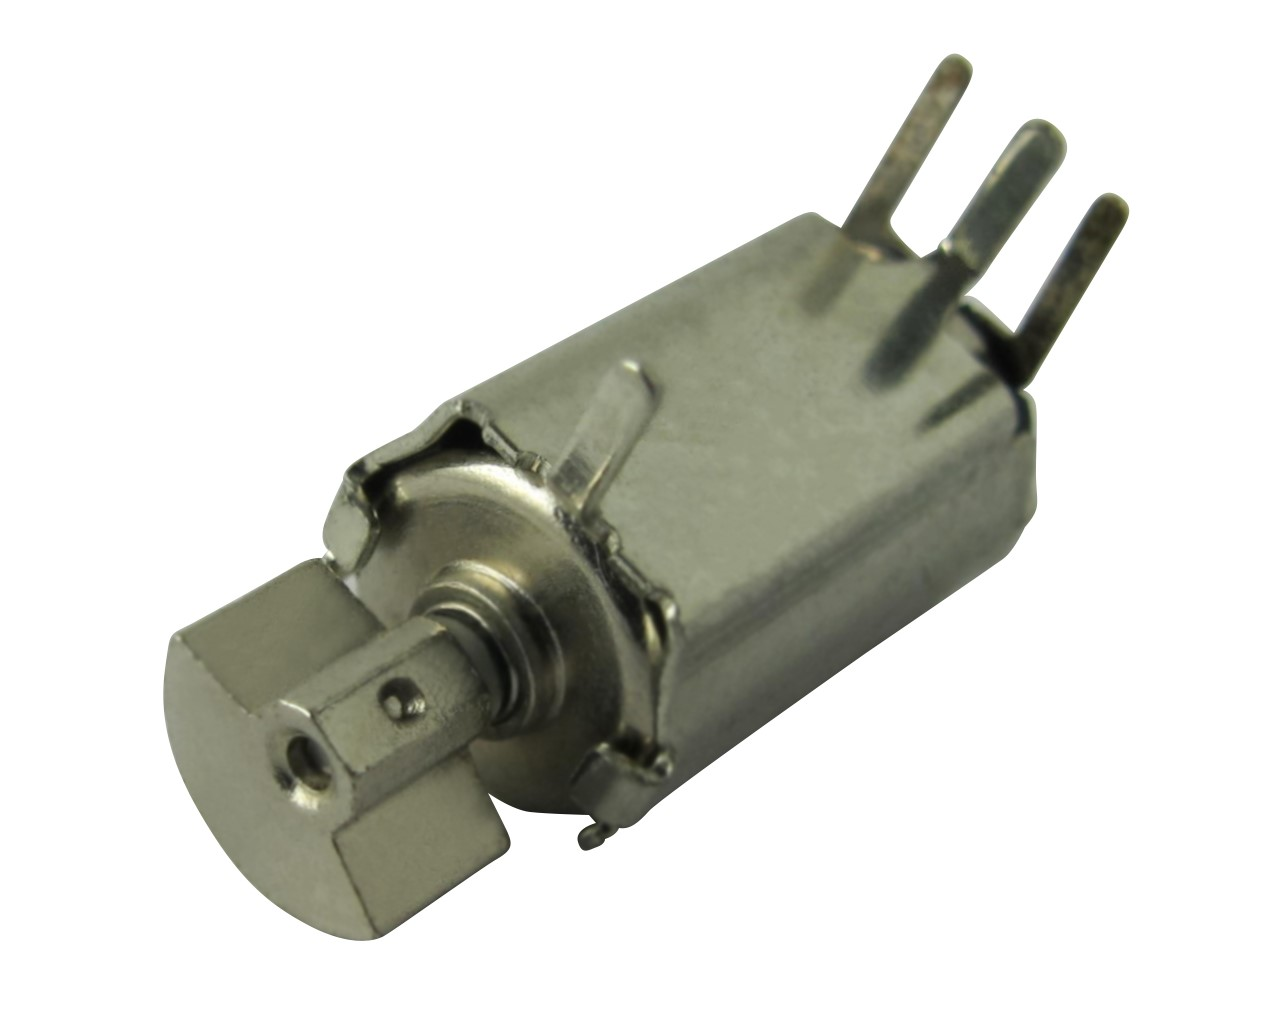 Z6SCAA0061141 Cylindrical Vibrator Motor